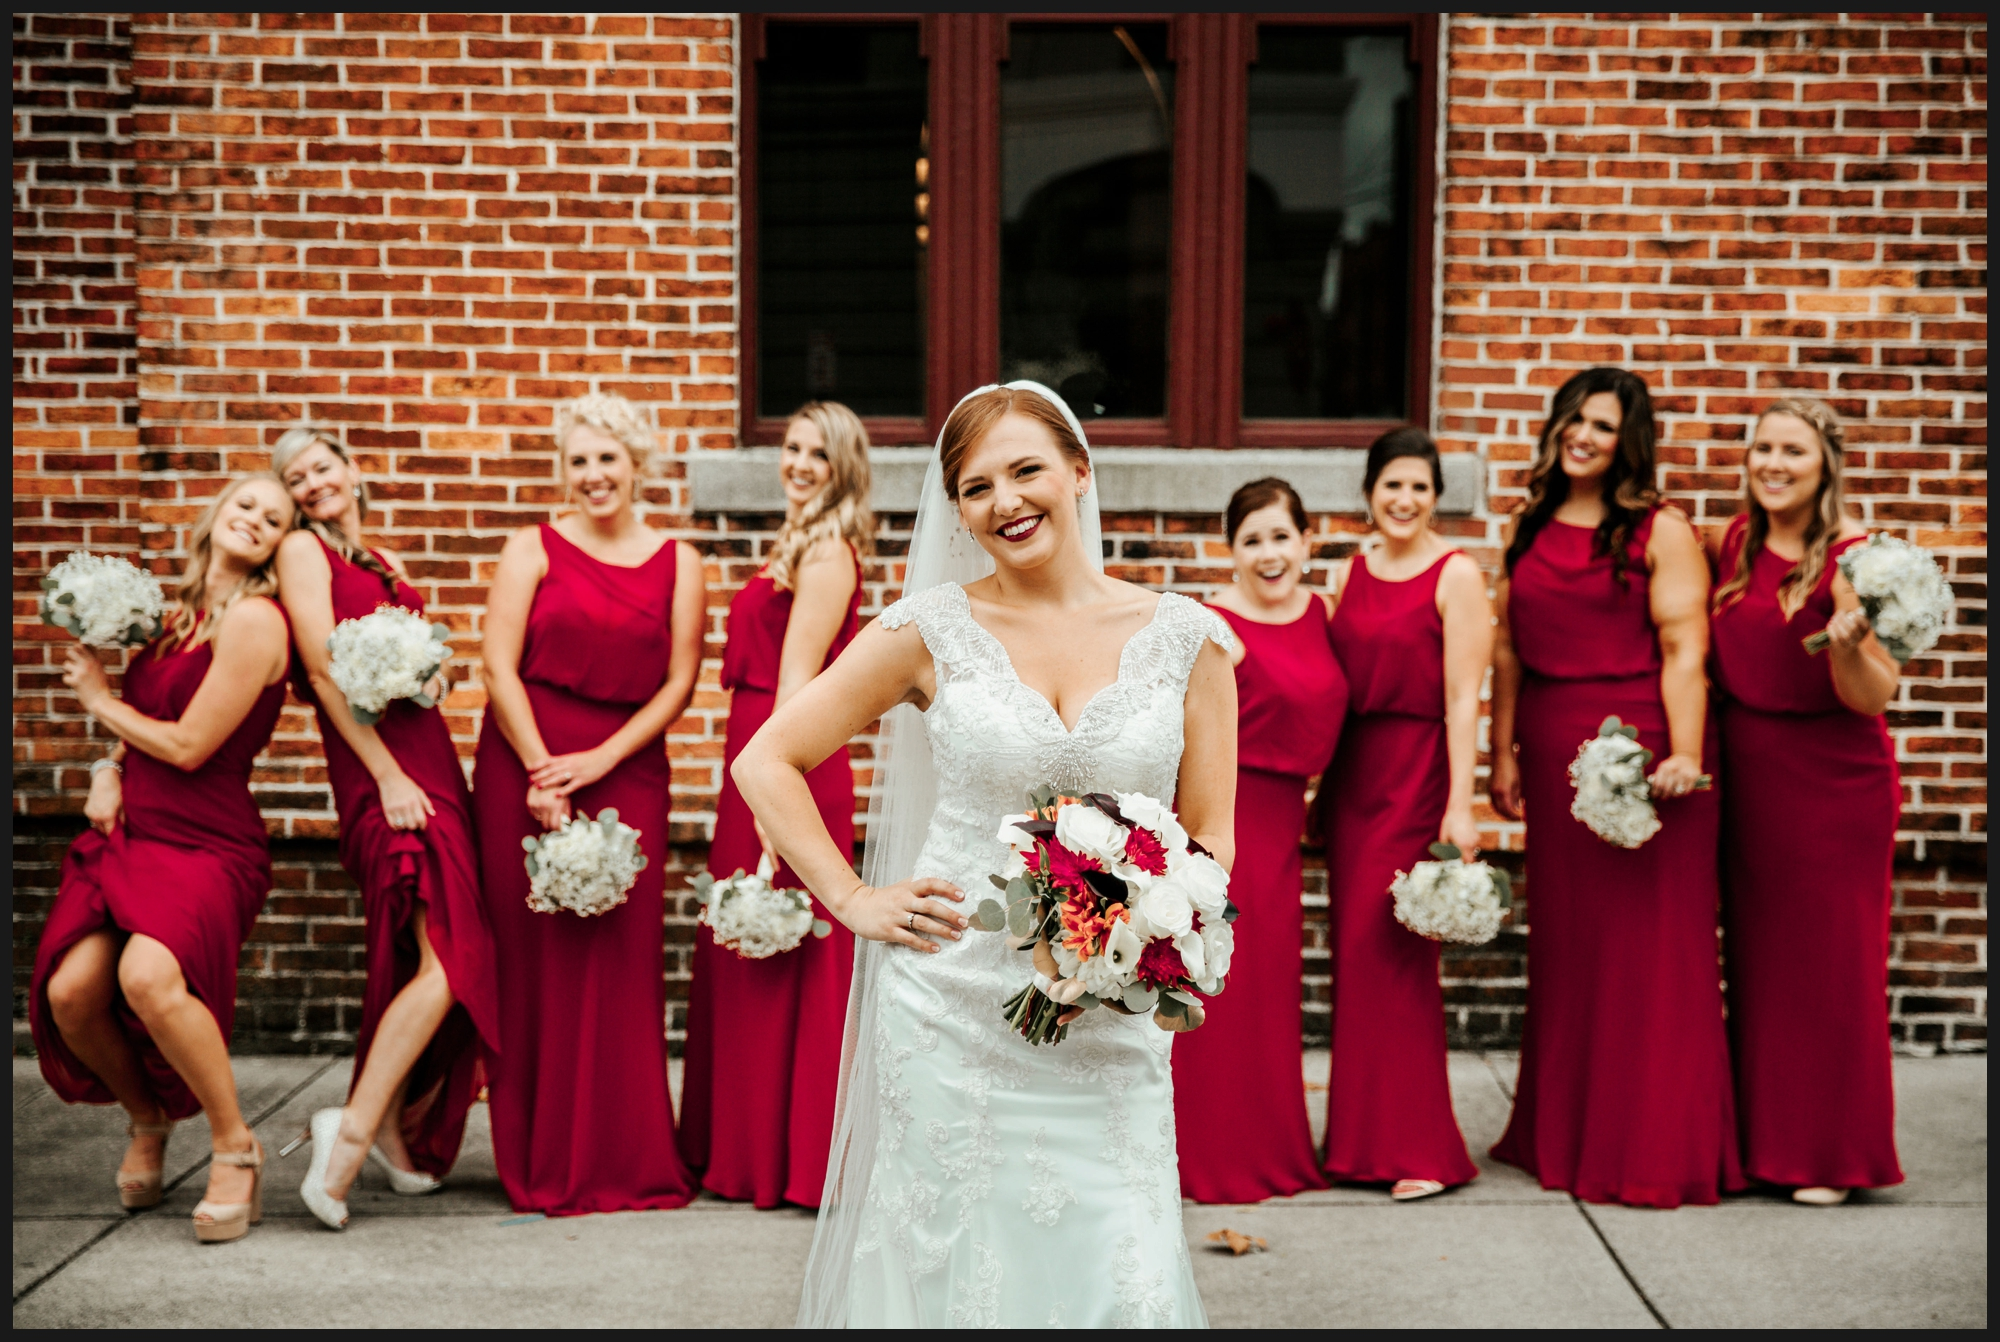 Orlando-Wedding-Photographer-destination-wedding-photographer-florida-wedding-photographer-bohemian-wedding-photographer_0612.jpg